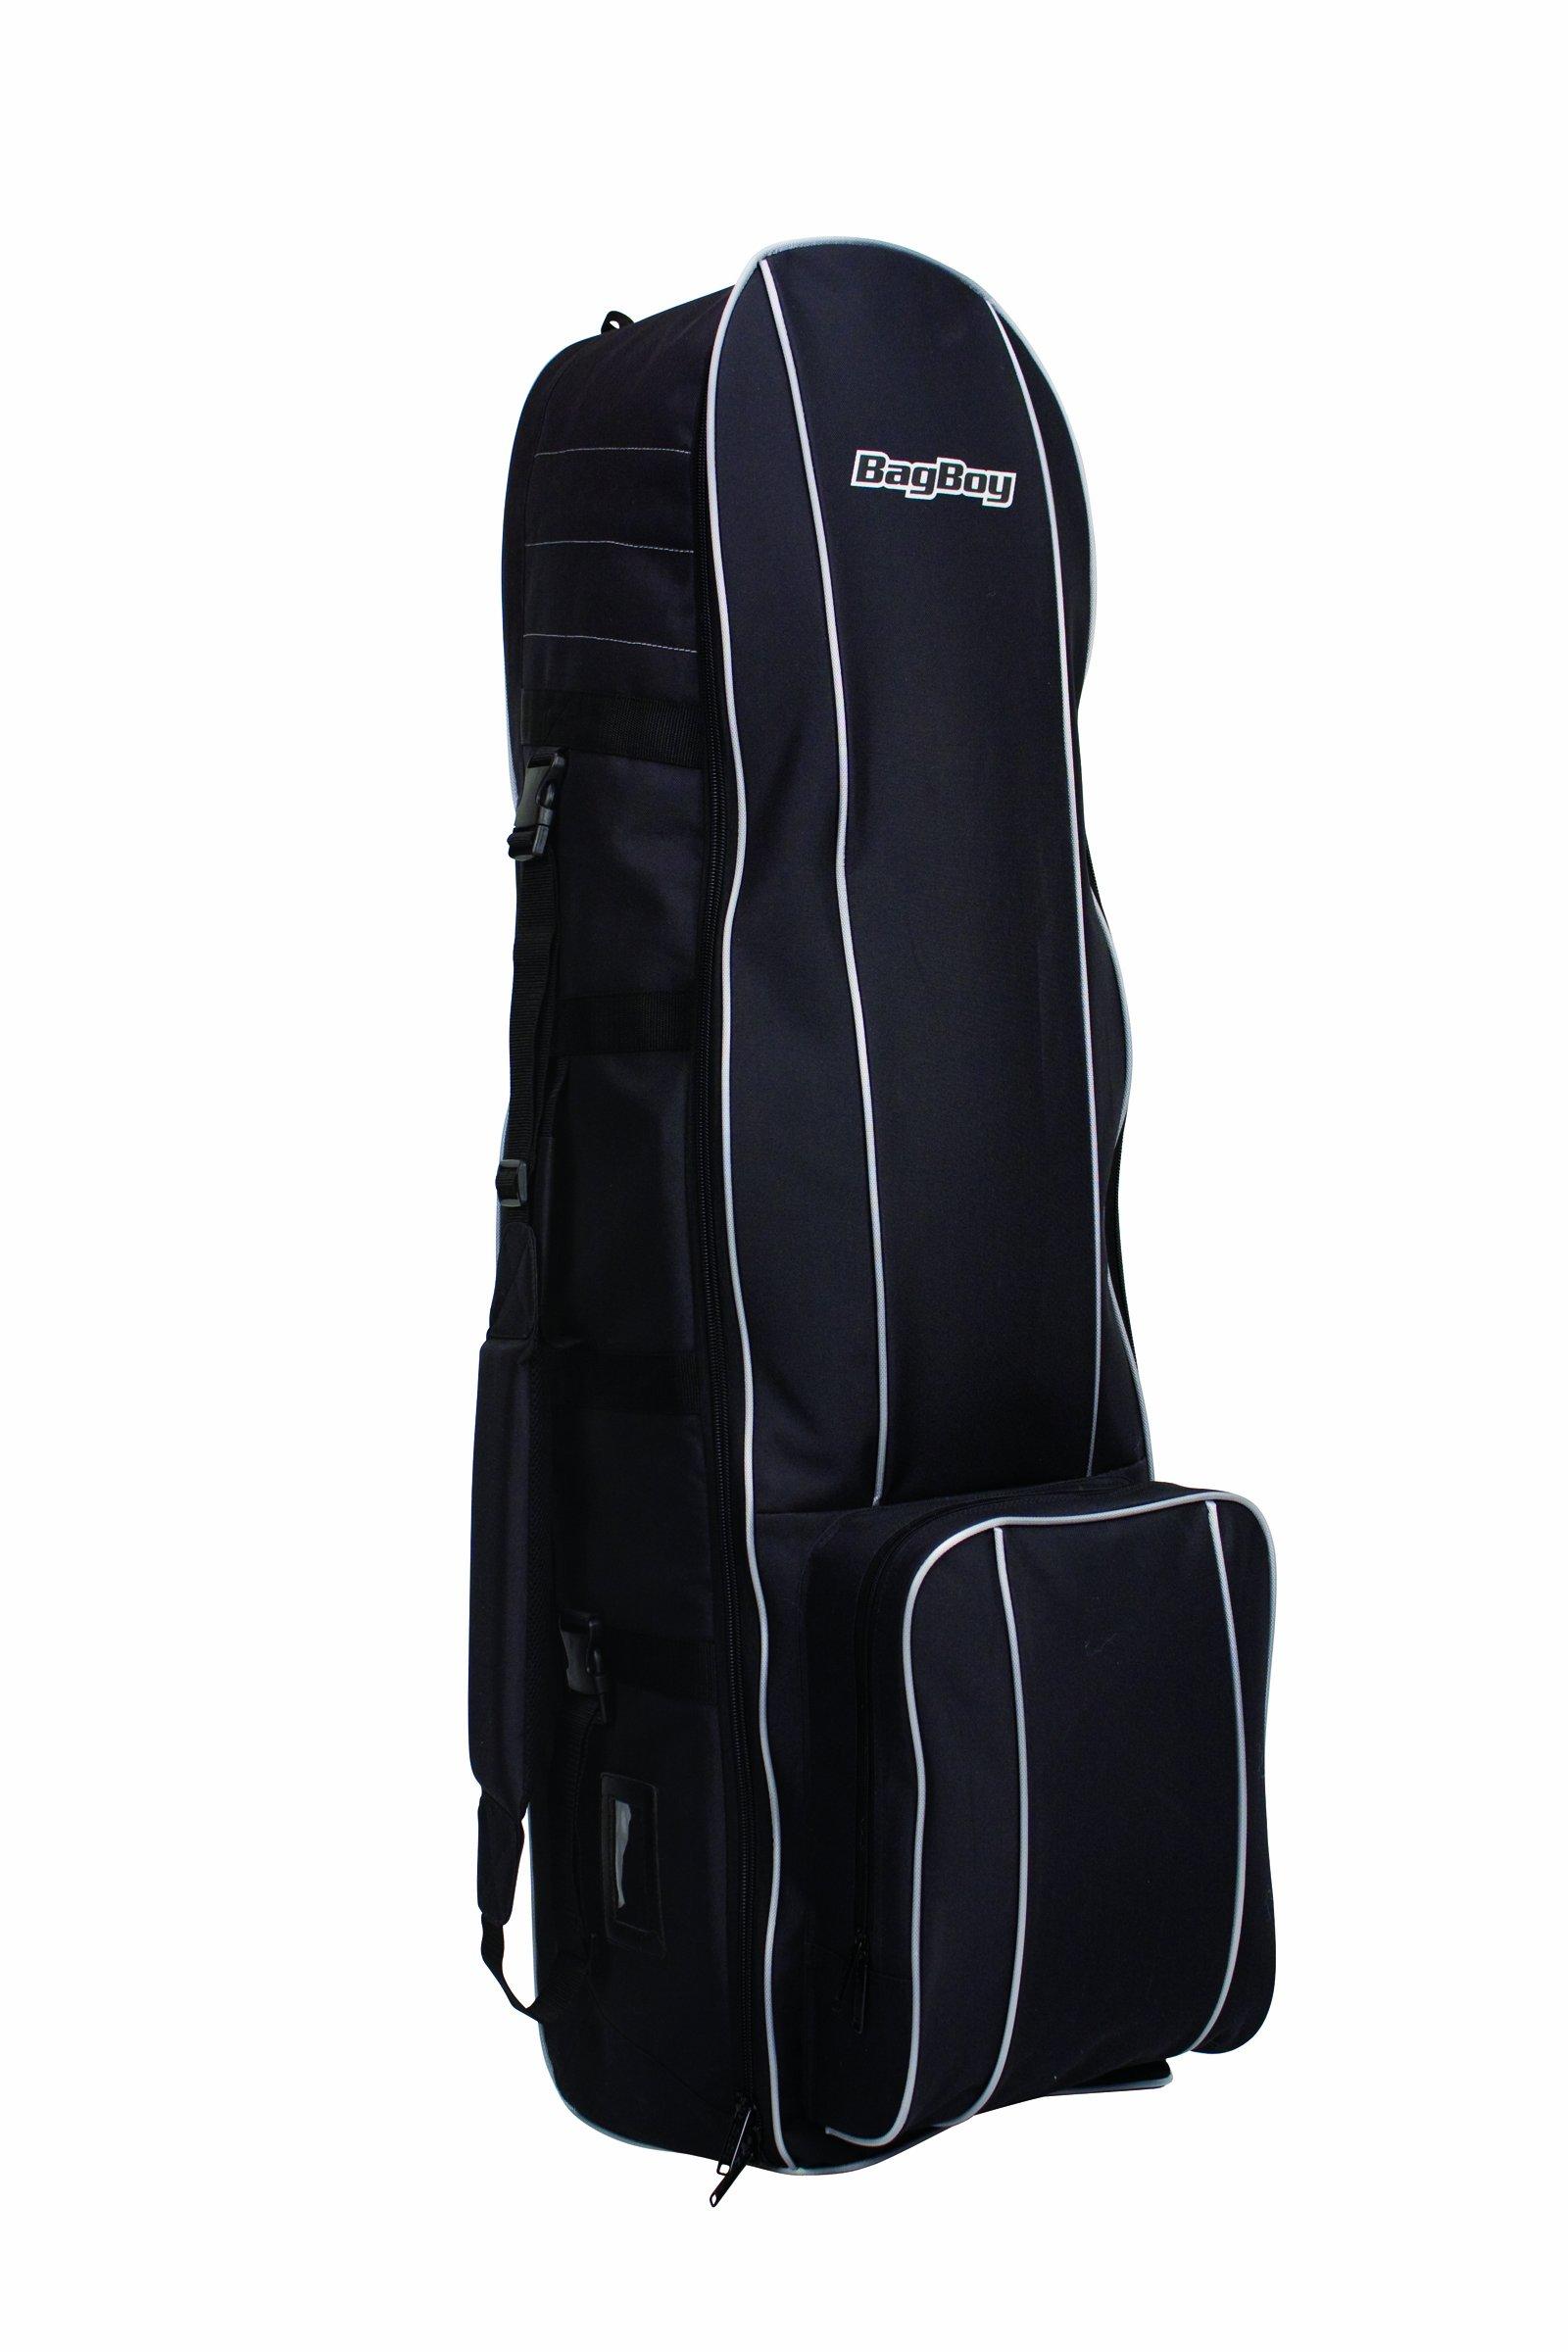 Bag Boy T-300 Travel Cover (Black/Silver)